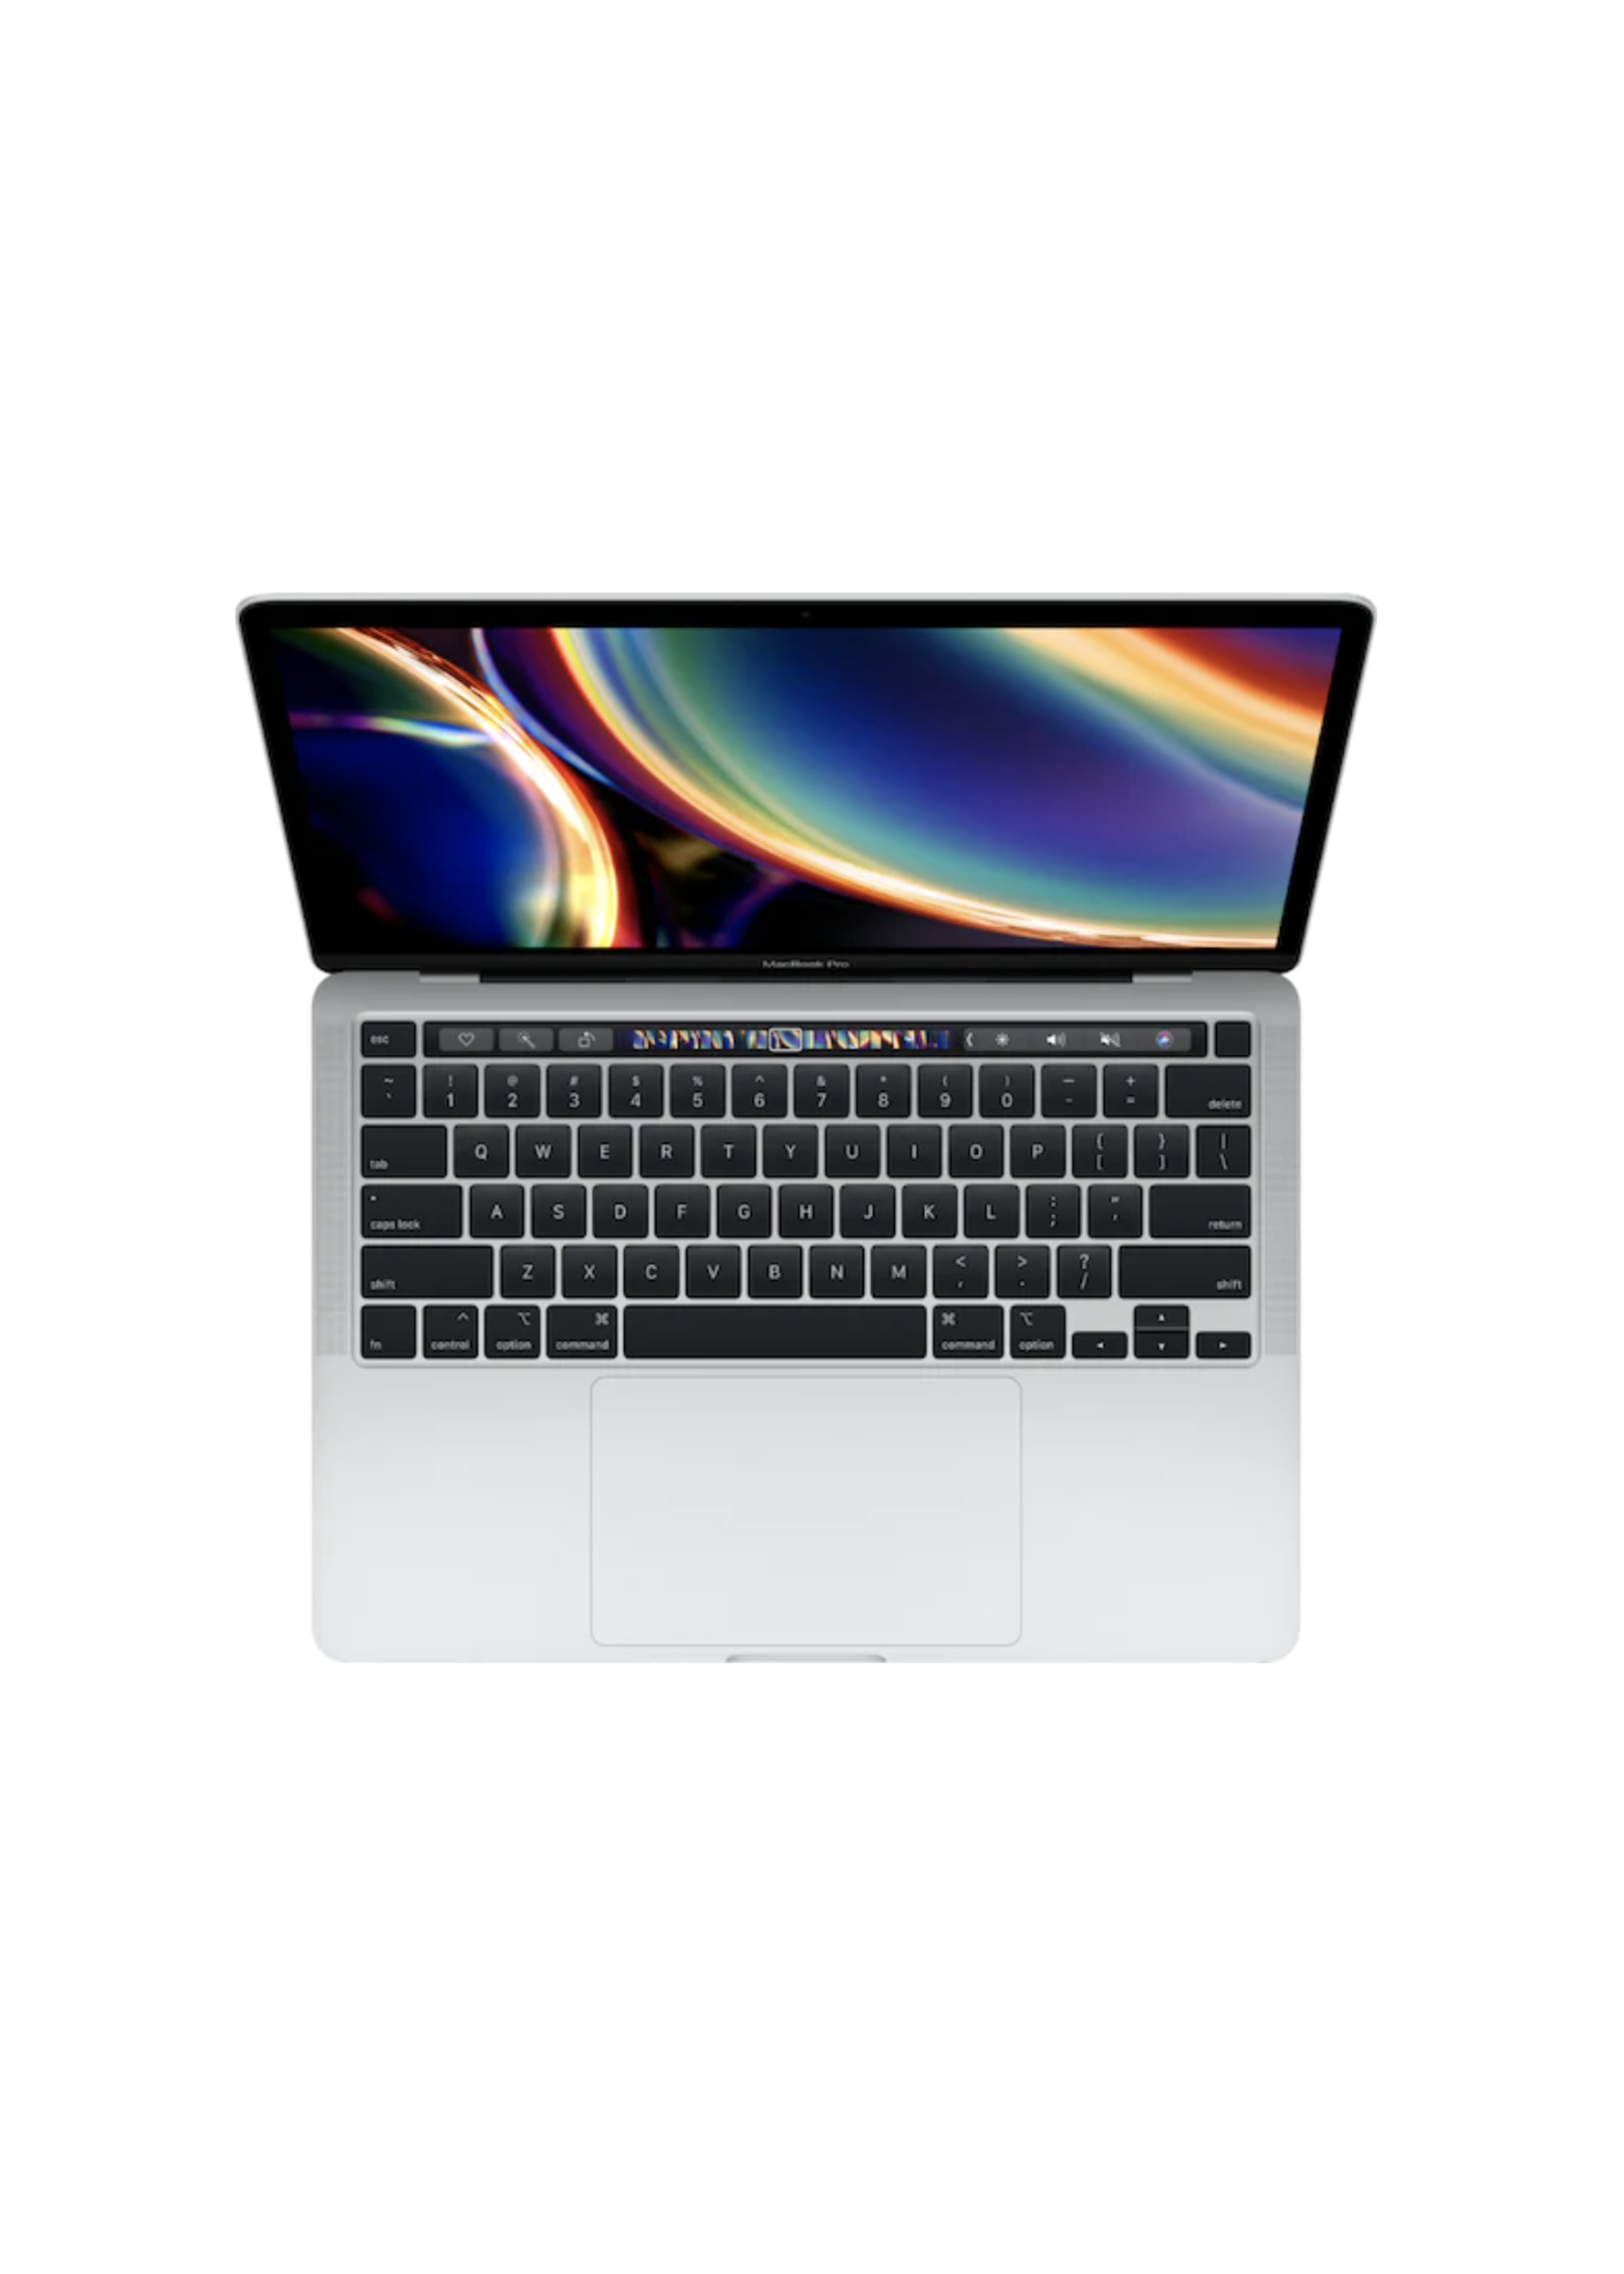 Apple MacBook Pro 13-inch 512GB Silver - High End